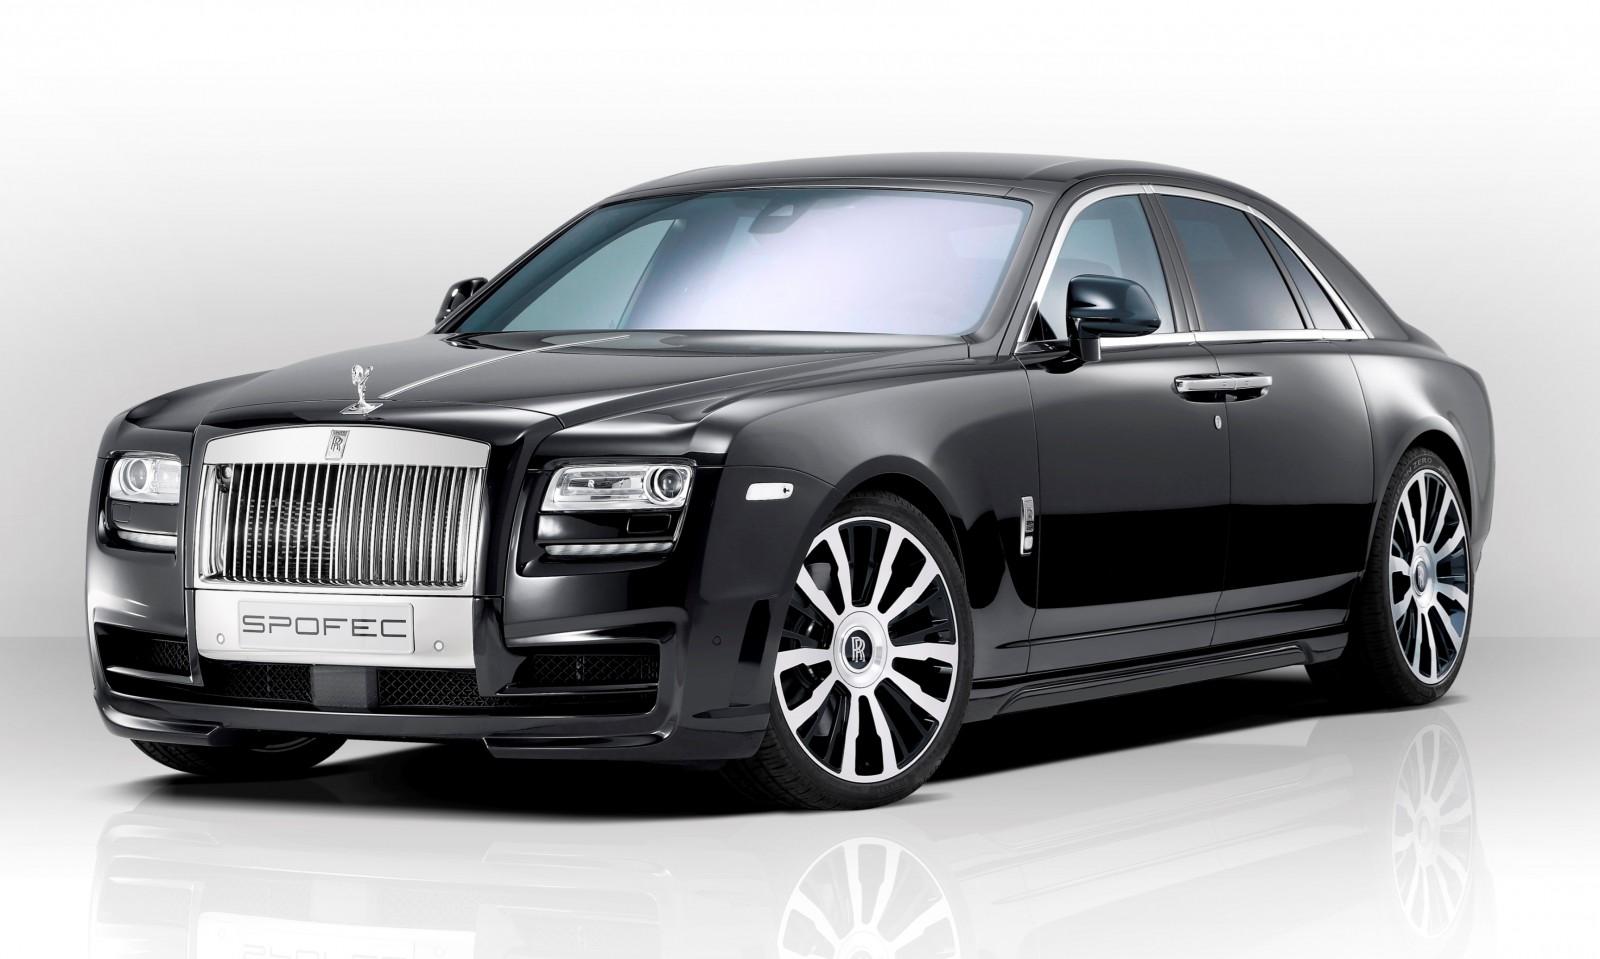 Novitec SPOFEC Rolls-Royce Ghost 2